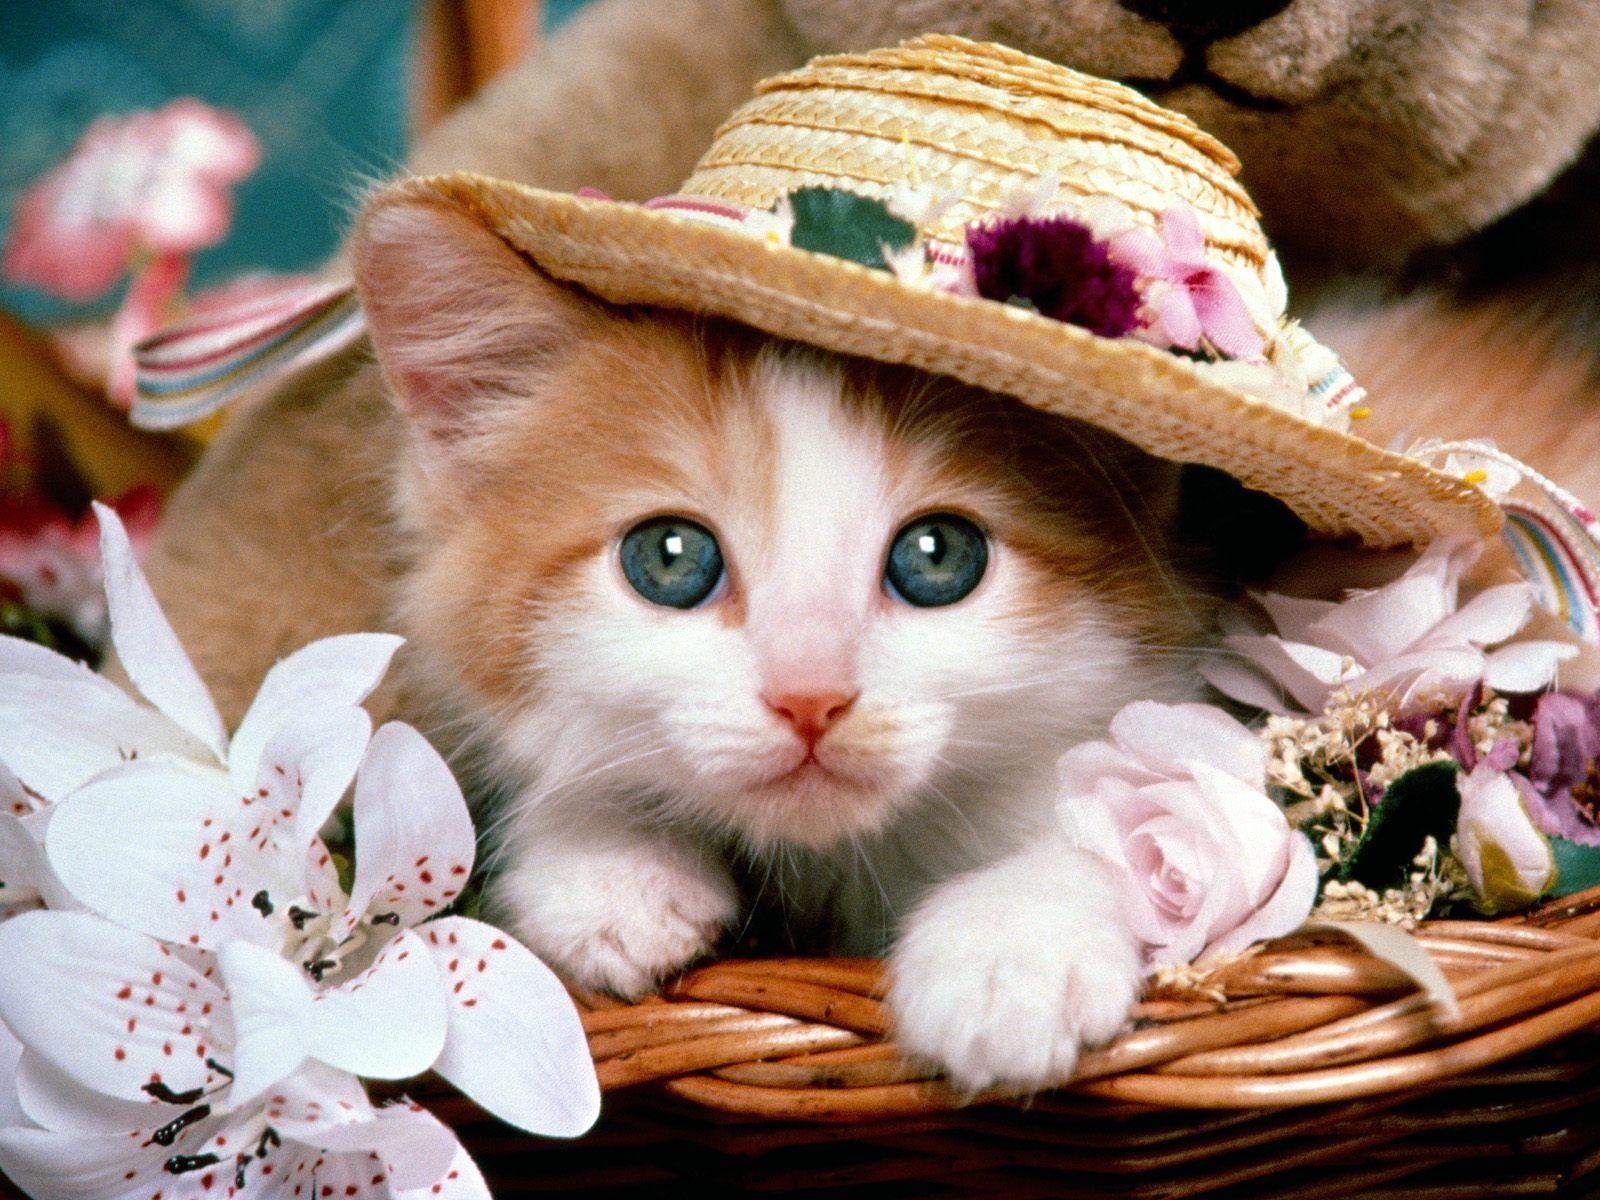 Oh Kitten يا هر Cute Cat Wallpaper Kittens Cutest Funny Cat Wallpaper